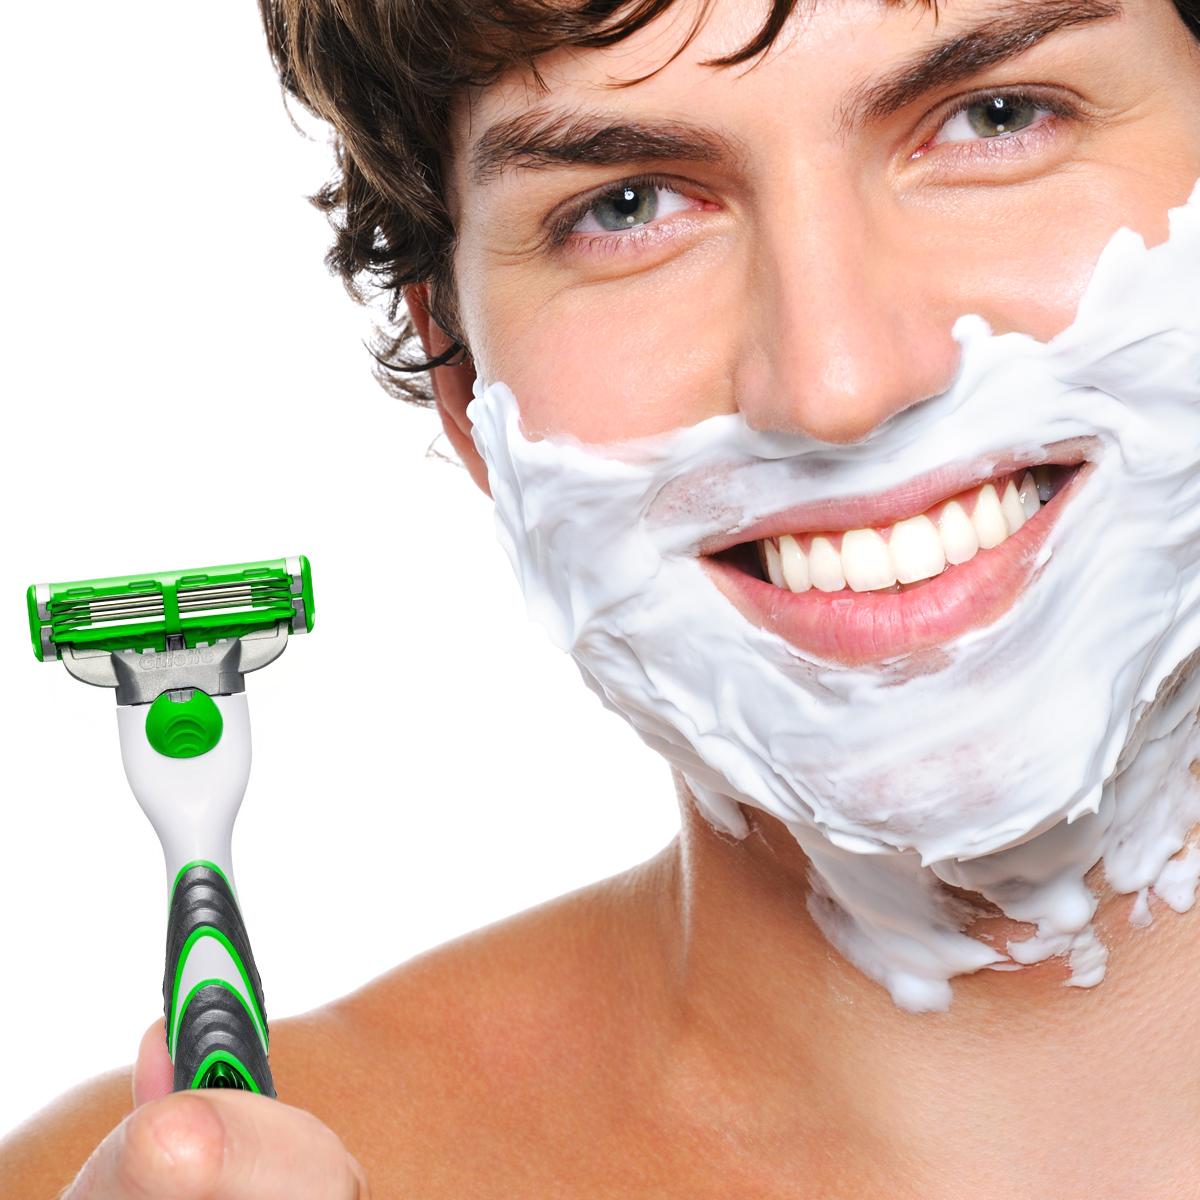 gillette mach 3 power razor for sensitive skin mens facial hair shaving blade. Black Bedroom Furniture Sets. Home Design Ideas